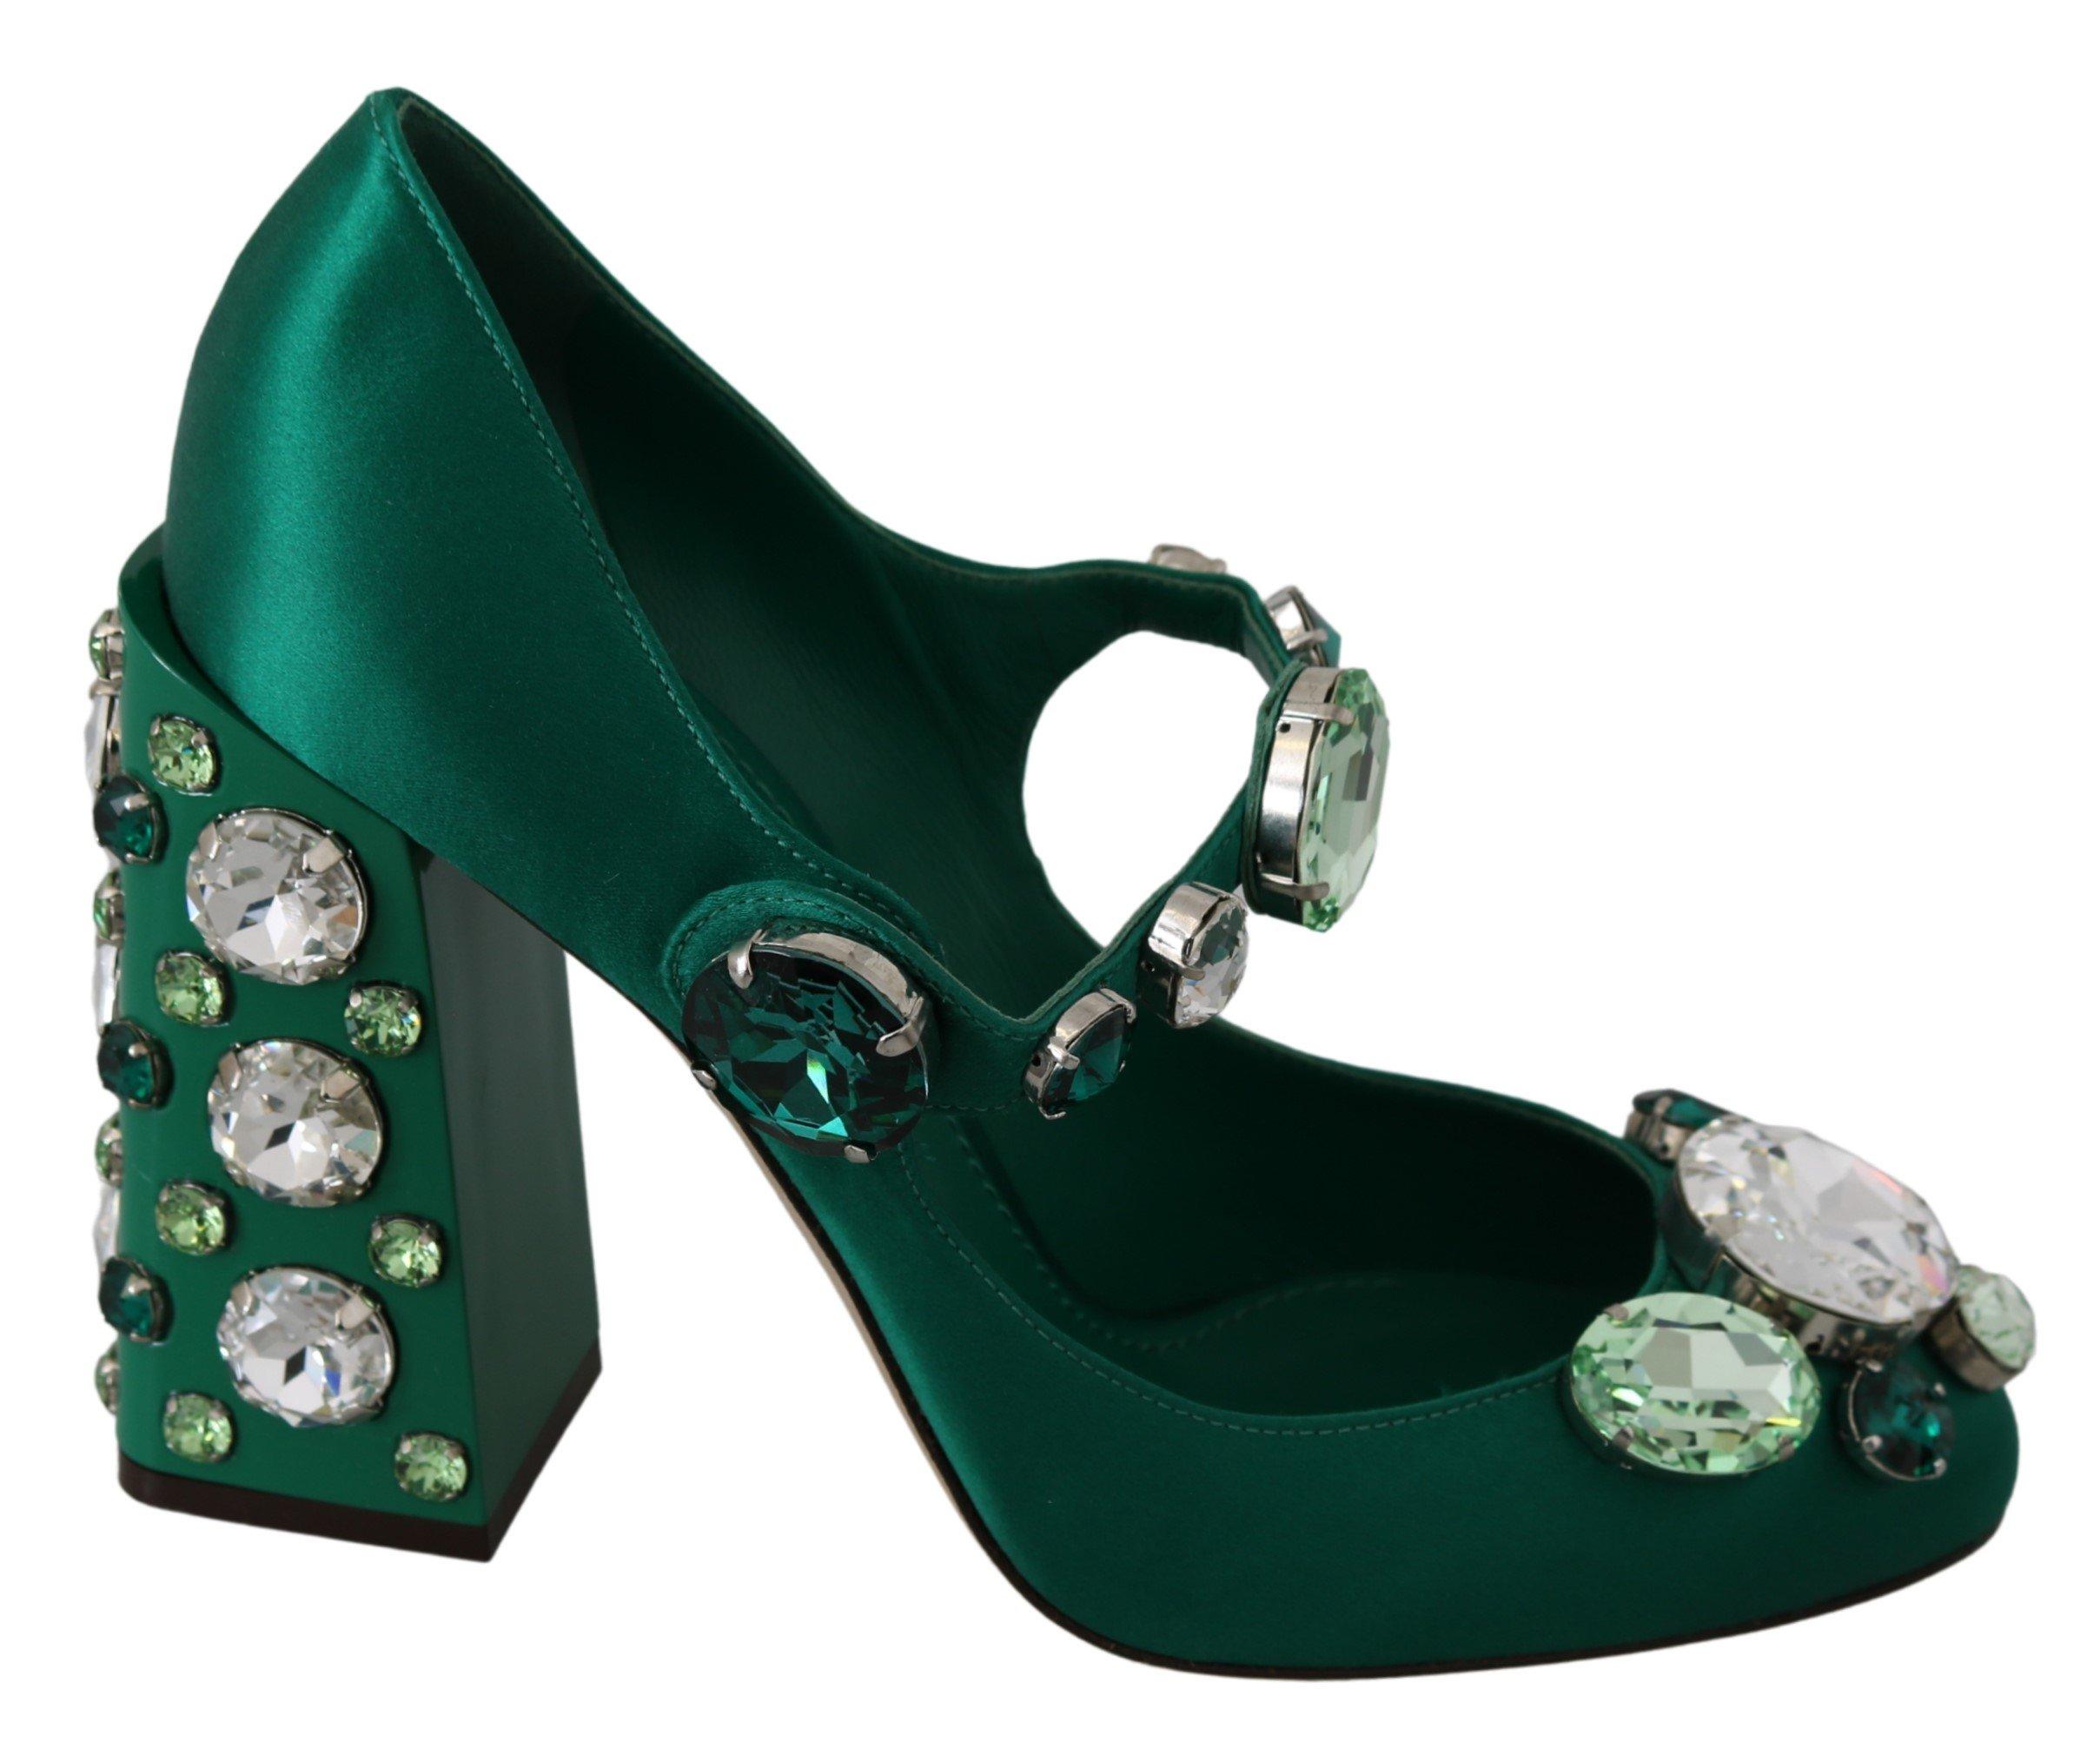 Dolce & Gabbana Women's Silk Mary Janes Crystal Pumps Green LA7234 - EU39/US8.5